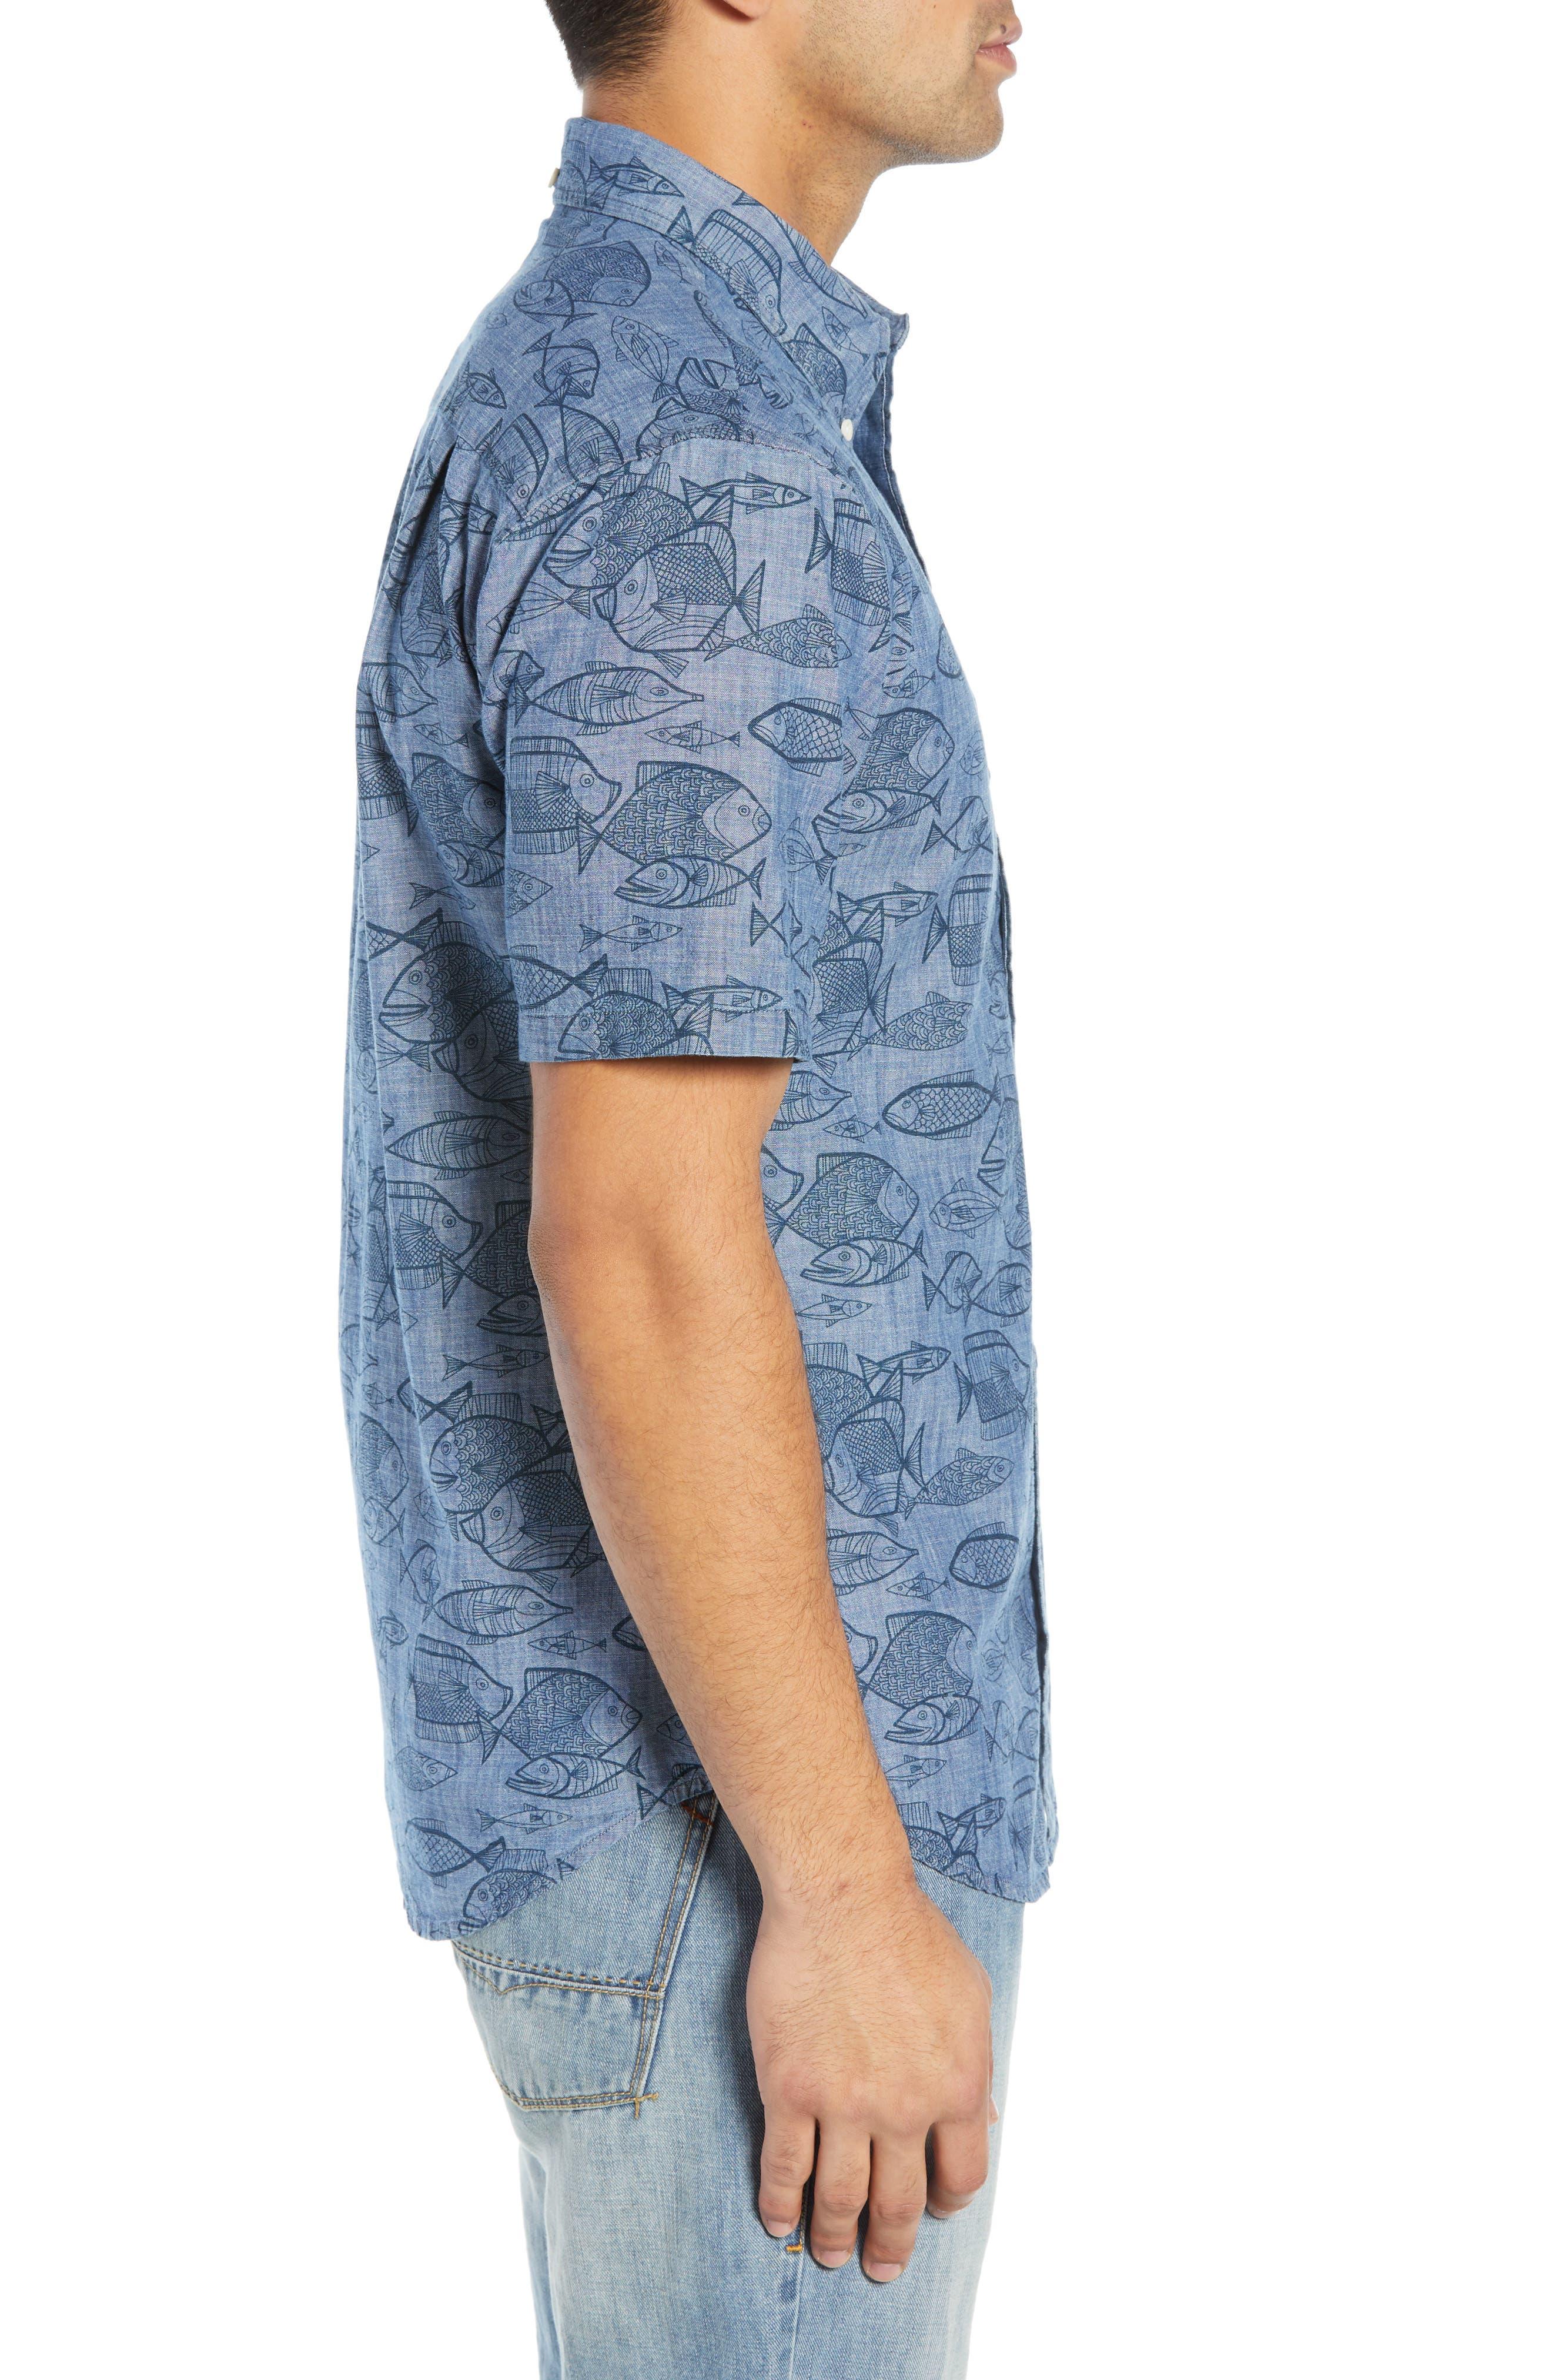 REYN SPOONER, Kauhulu Tailored Fit Sport Shirt, Alternate thumbnail 4, color, CHAMBRAY BLUE